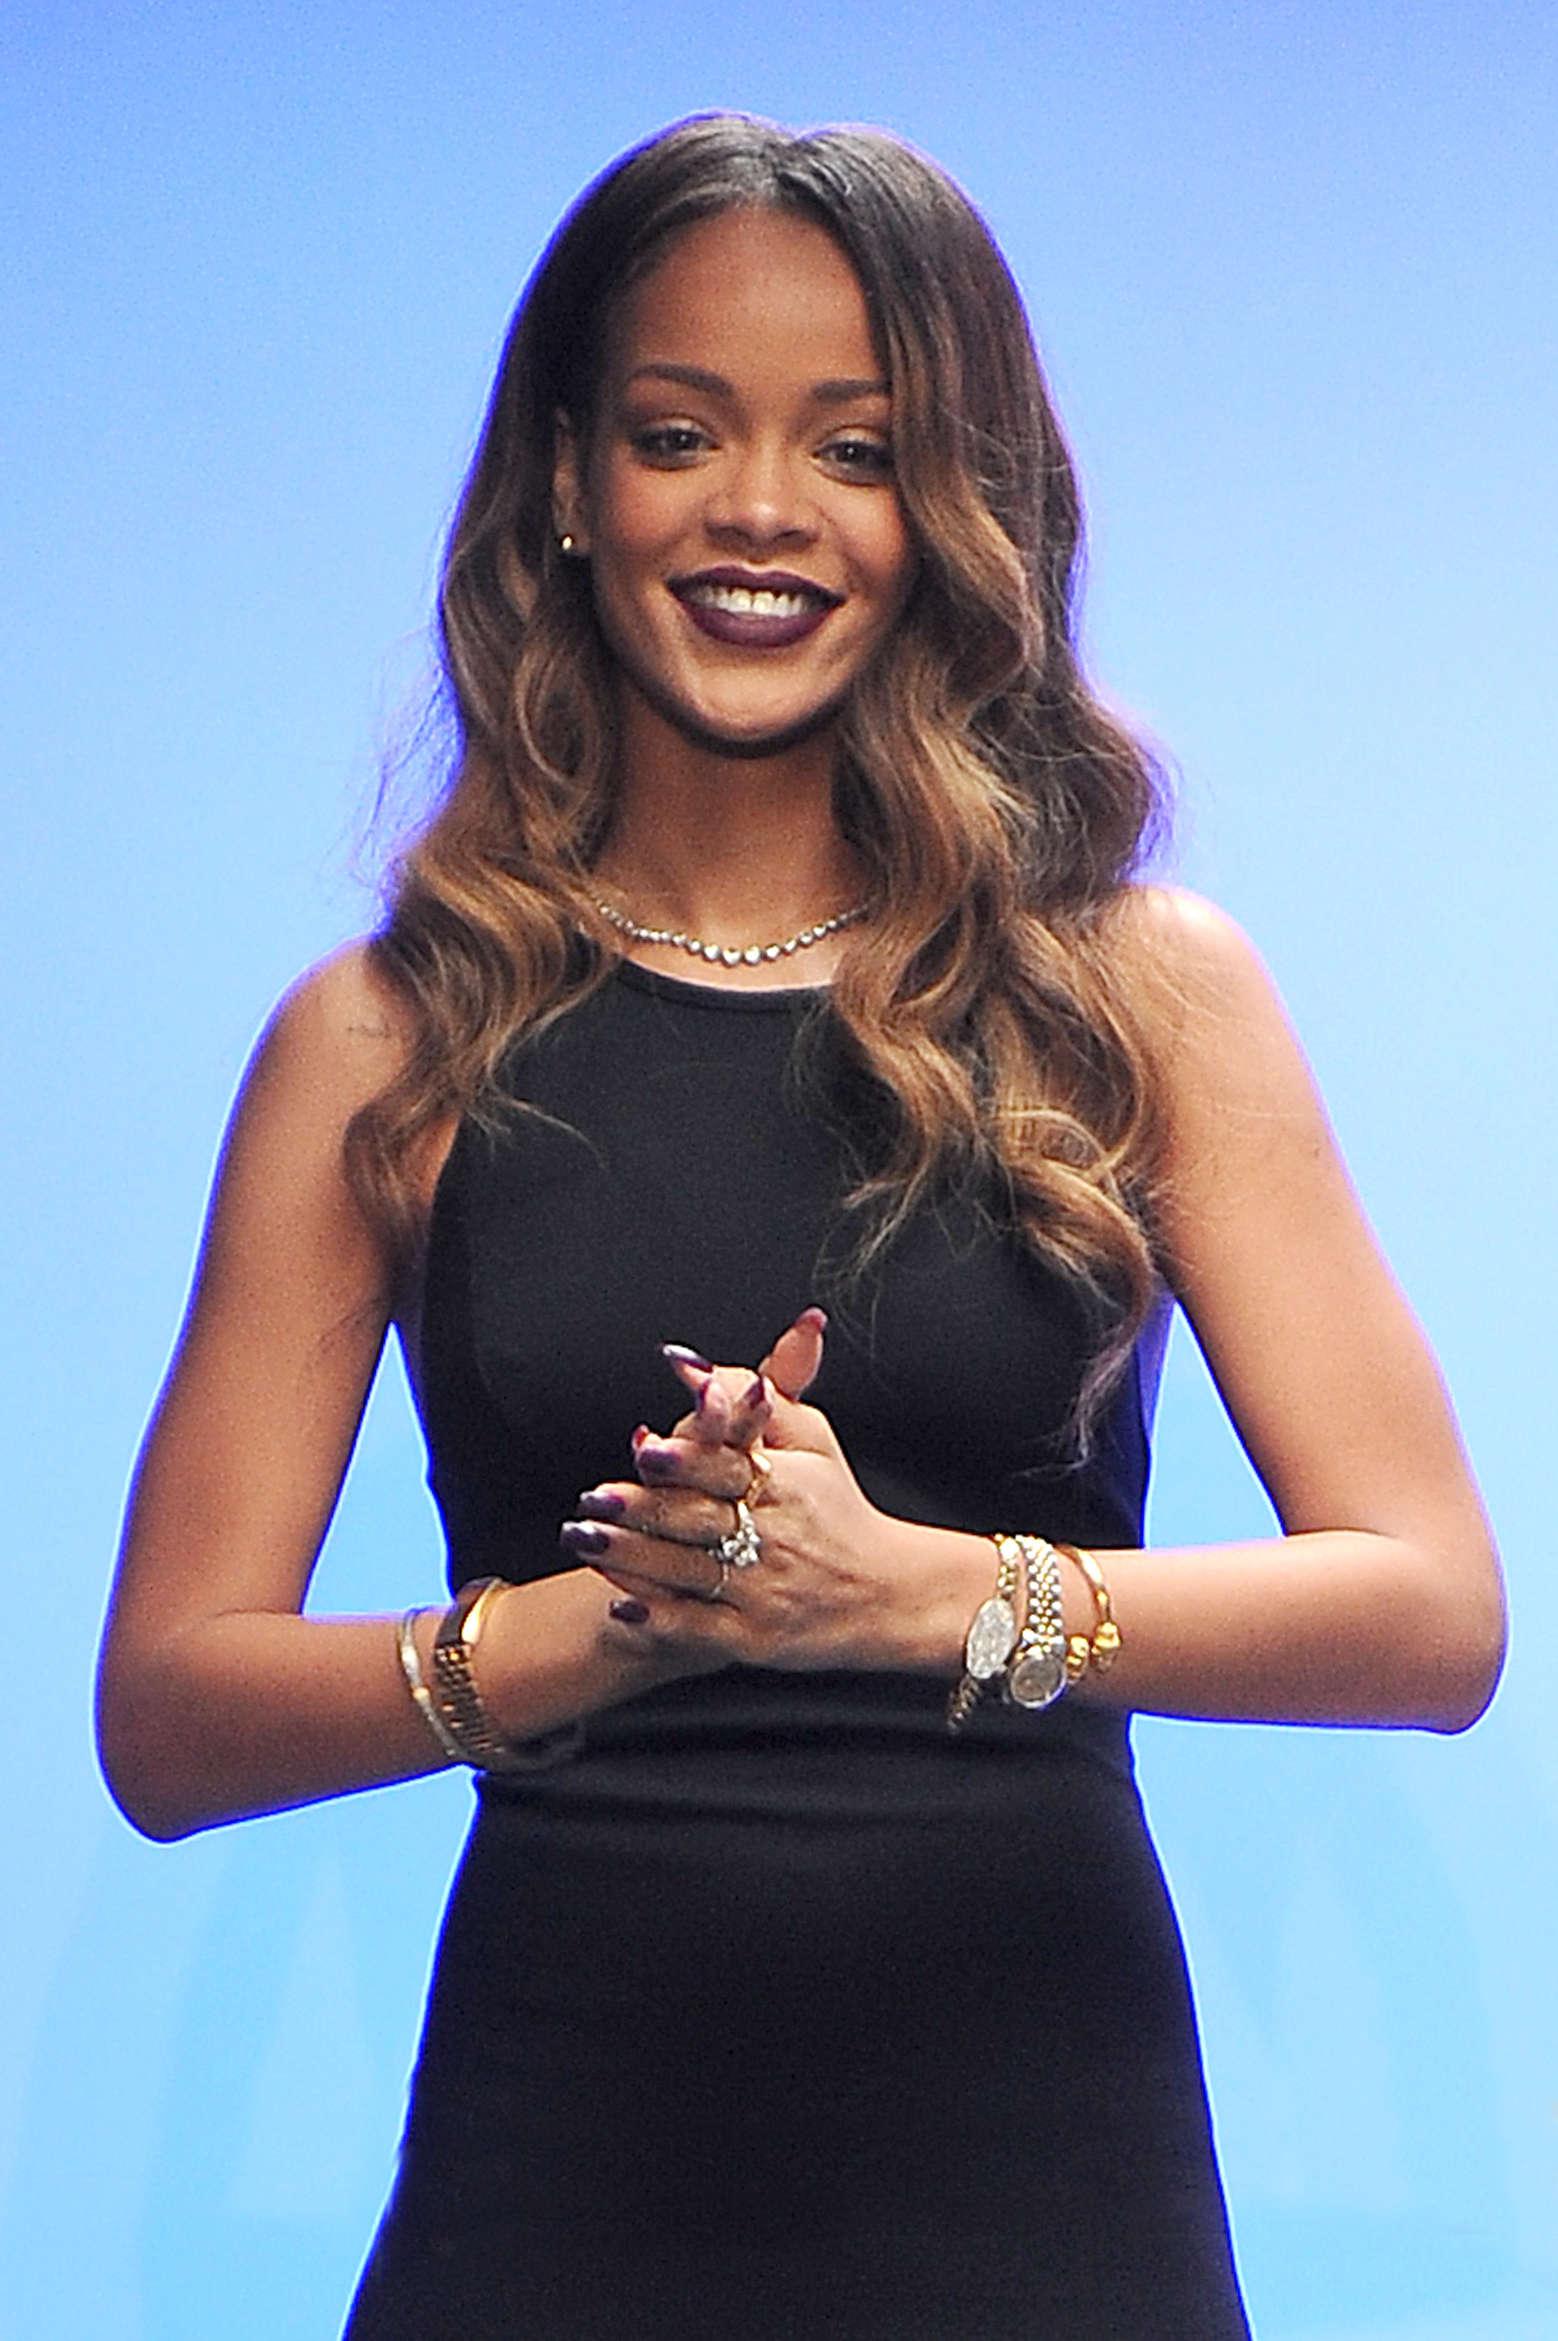 Rihanna Photos: 2013 Fashion Show in New York – Opening ... |Rihanna 2013